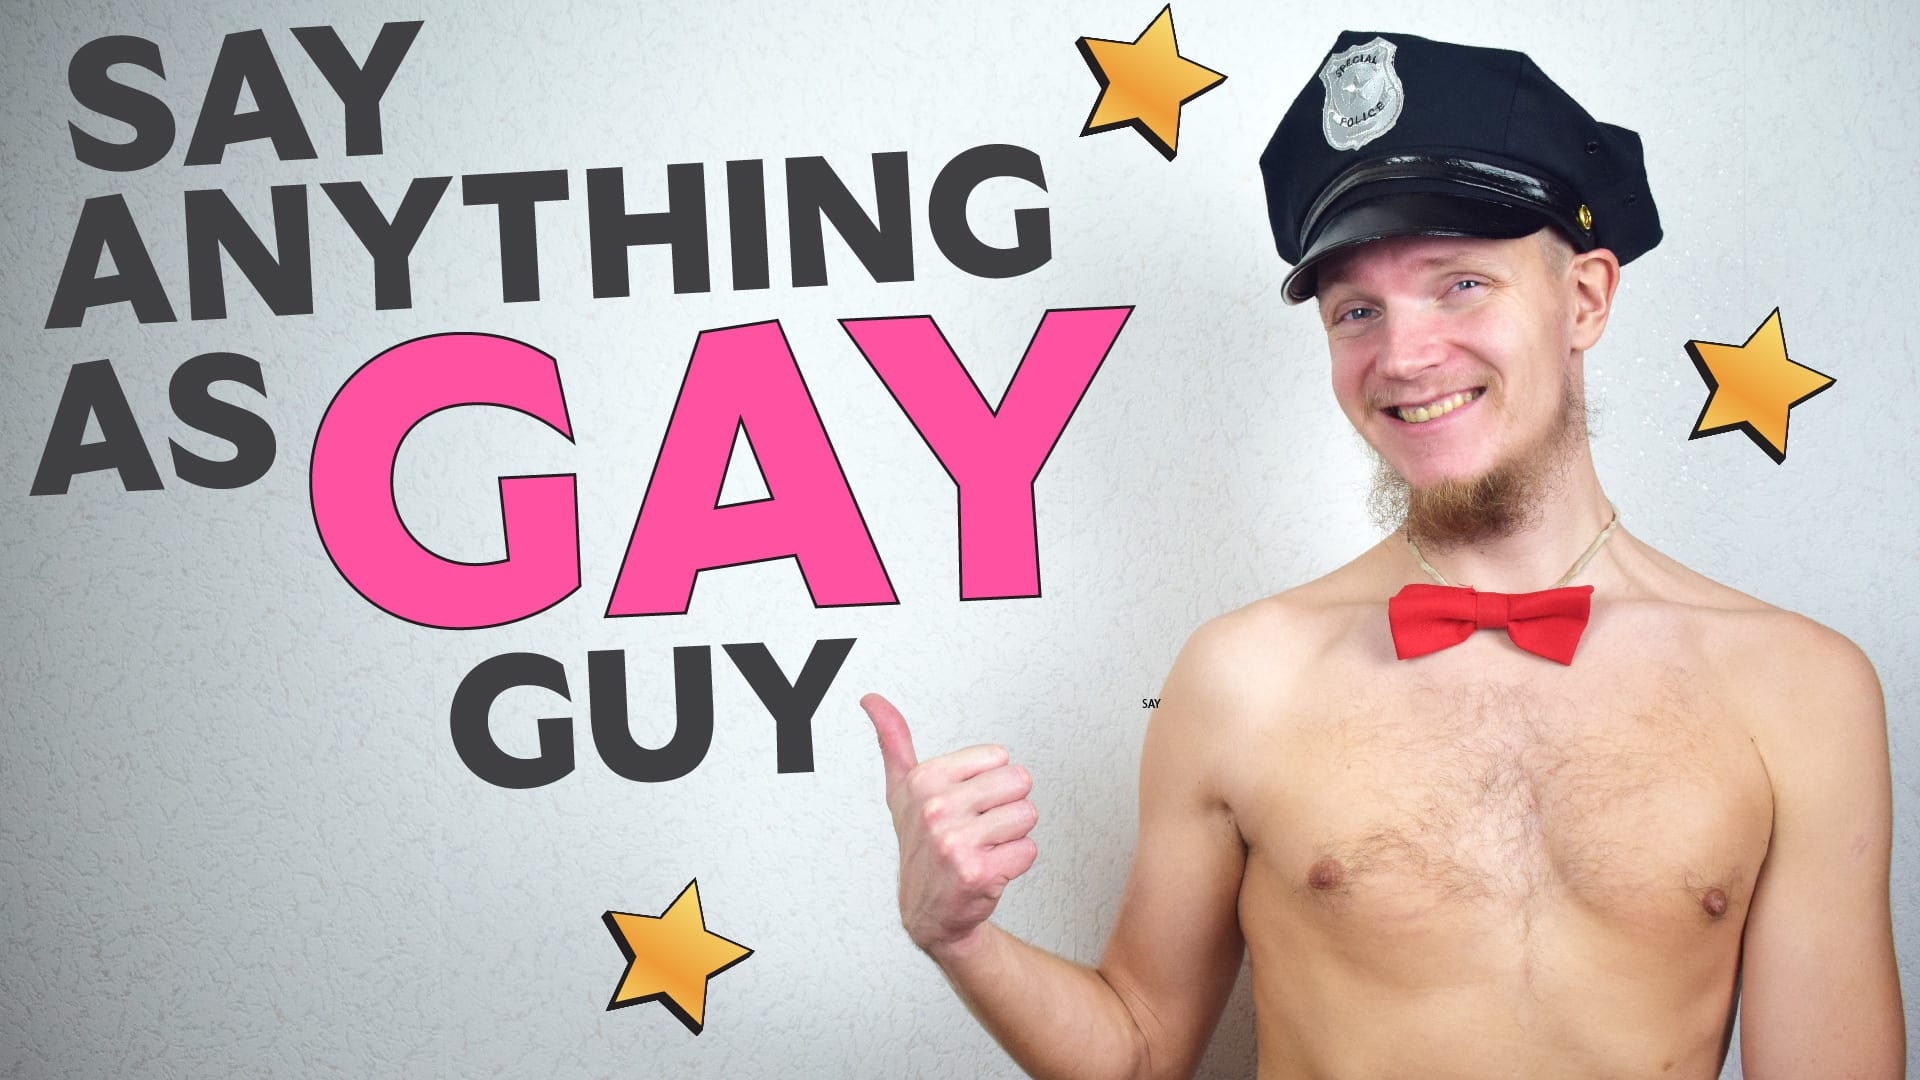 Gay guy Nude Photos 10